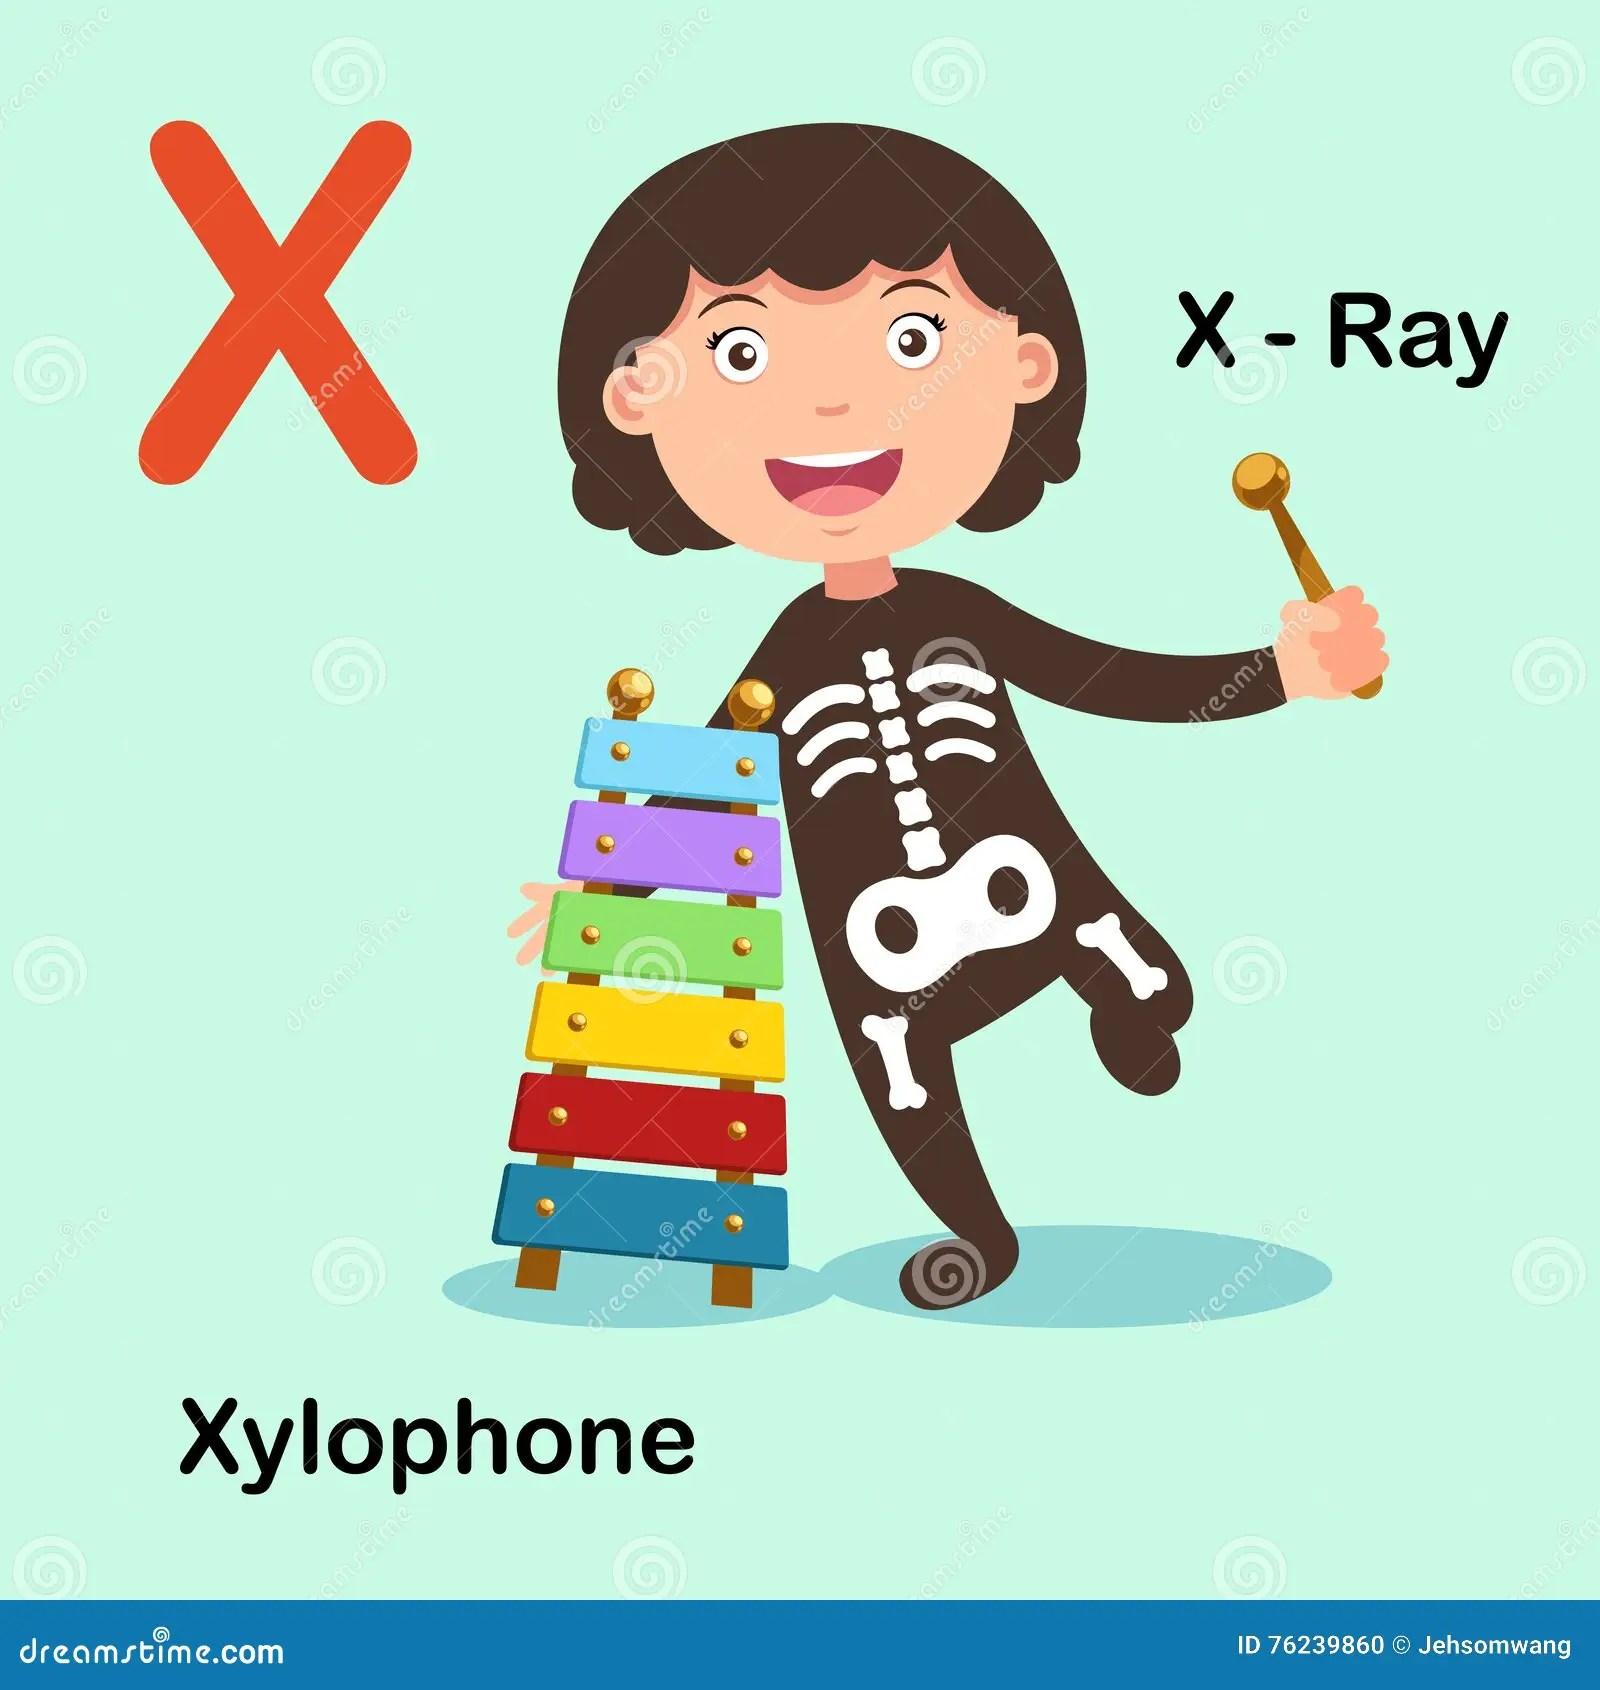 Illustration Alphabet Letter X X Ray Xylophone Stock Vector